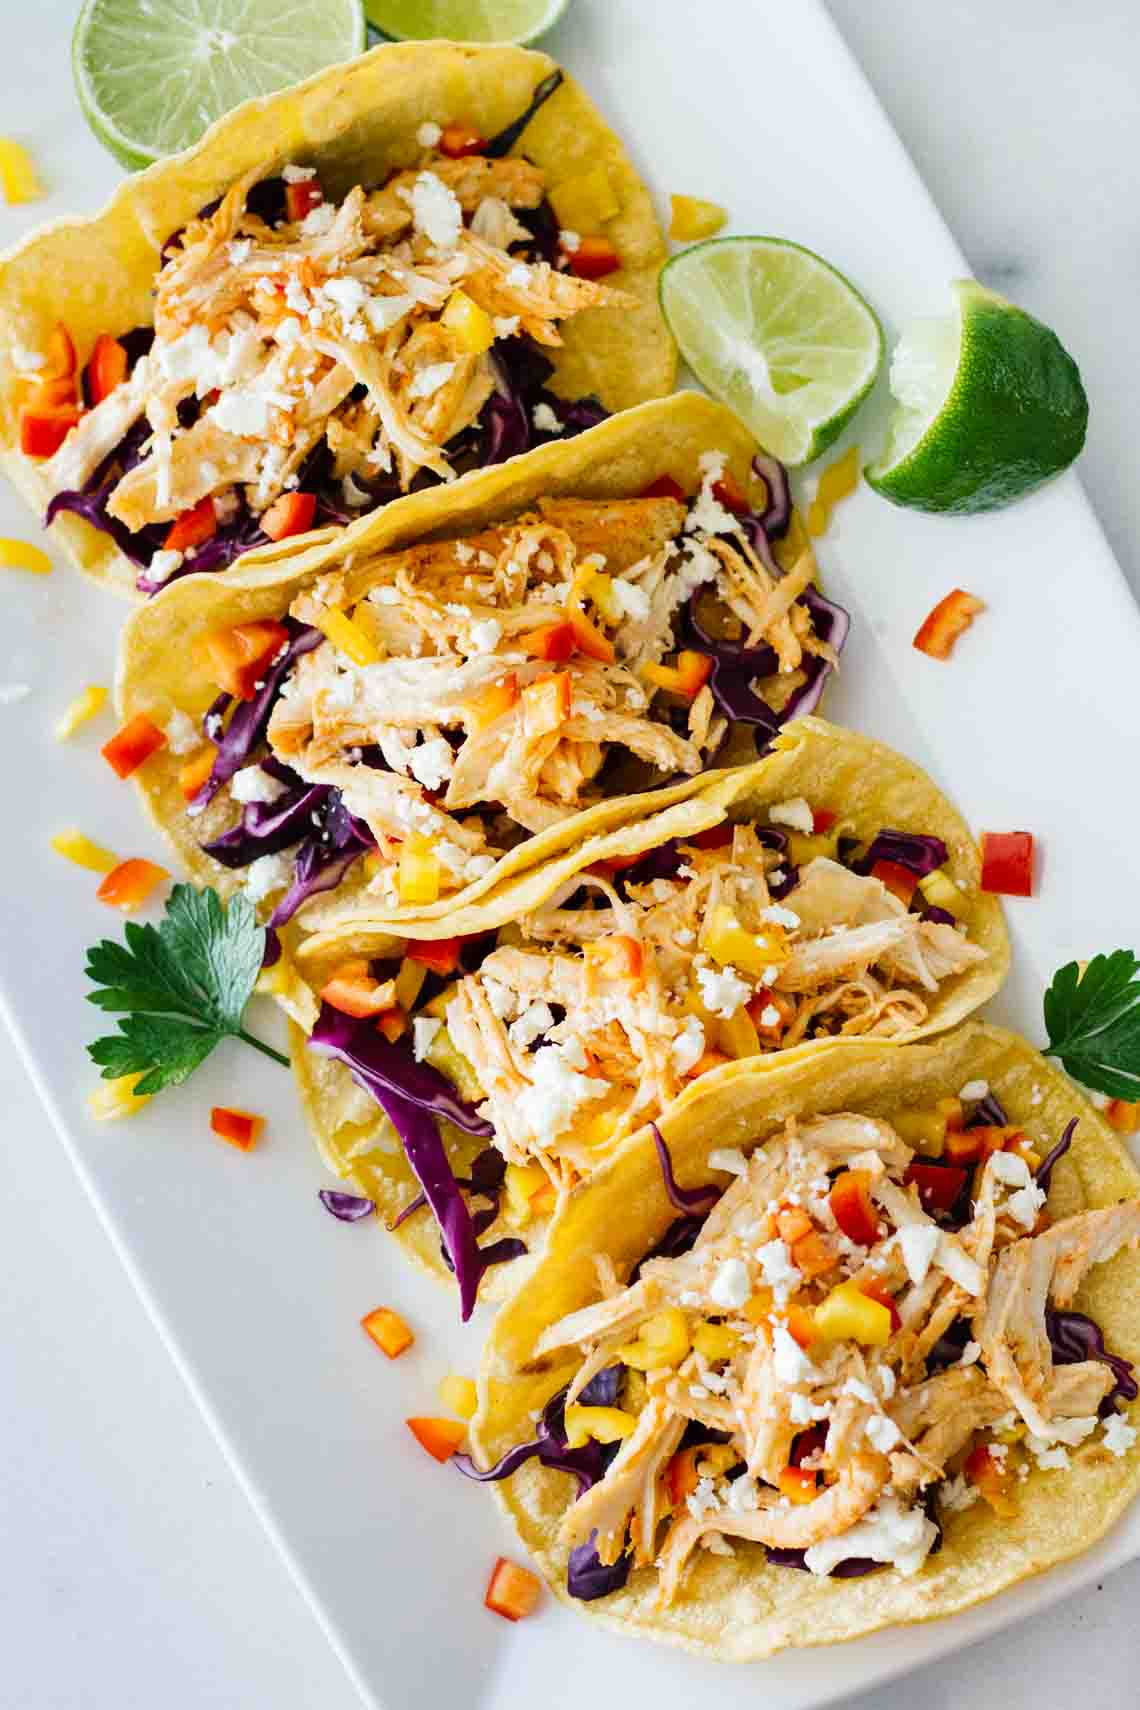 Healthy Easy Dinner  Healthy Sriracha Shredded Chicken Tacos Jar Lemons